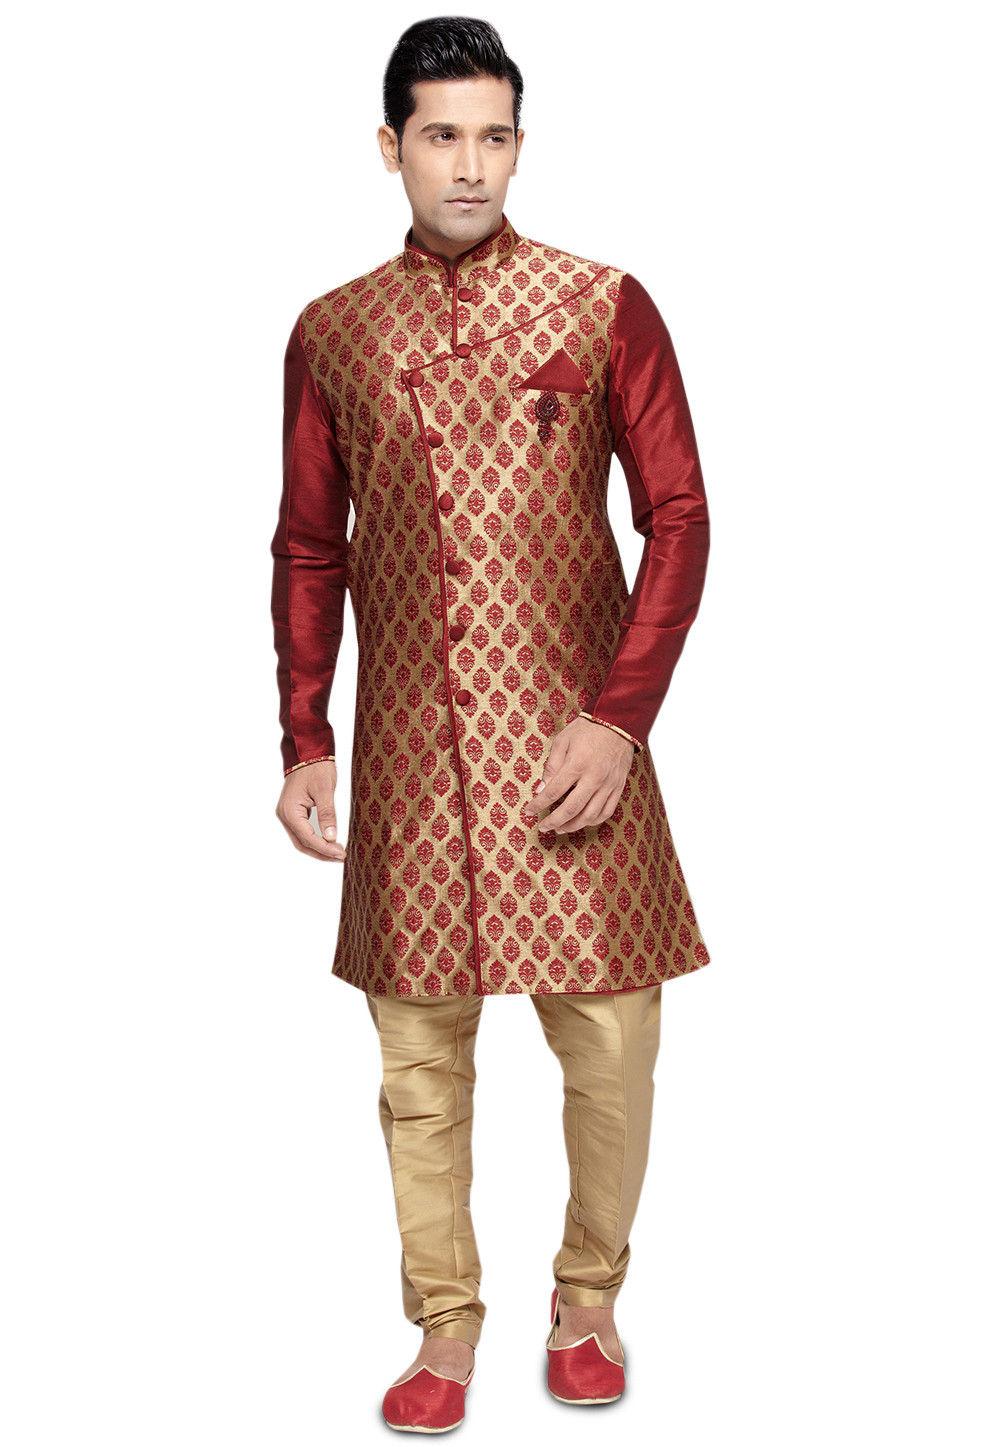 Brocade Sherwani in Golden and Maroon